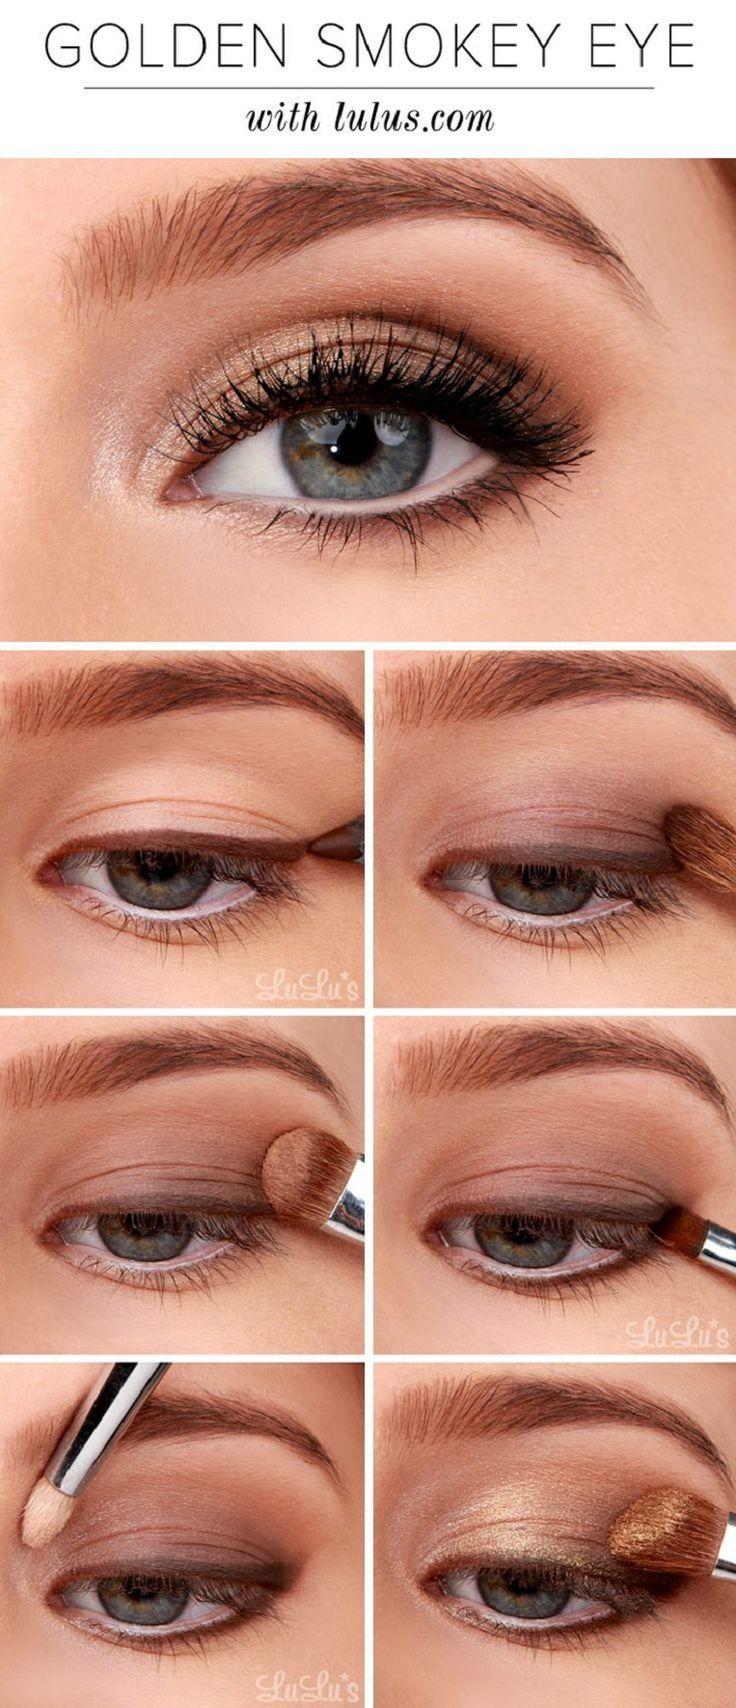 Golden Smokey Eye Tutorial - 10 Brown Eyeshadow Tutorials for Seductive Eyes - GleamItUp